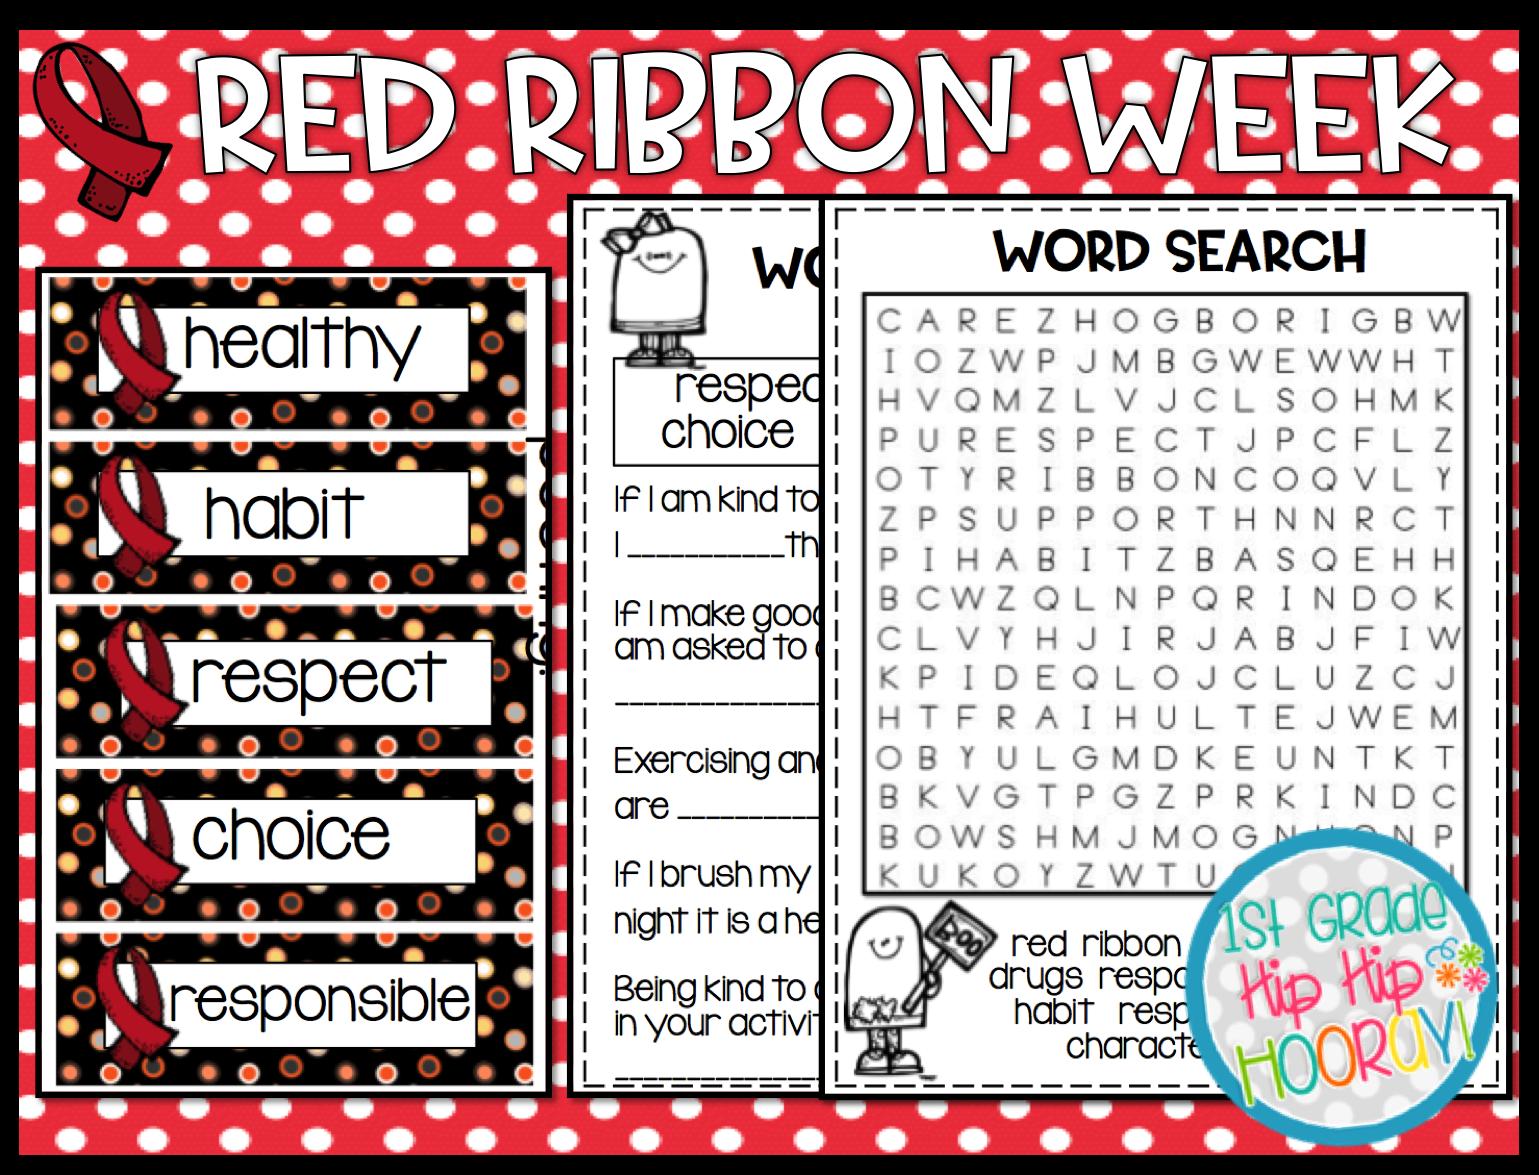 1st Grade Hip Hip Hooray Red Ribbon Week